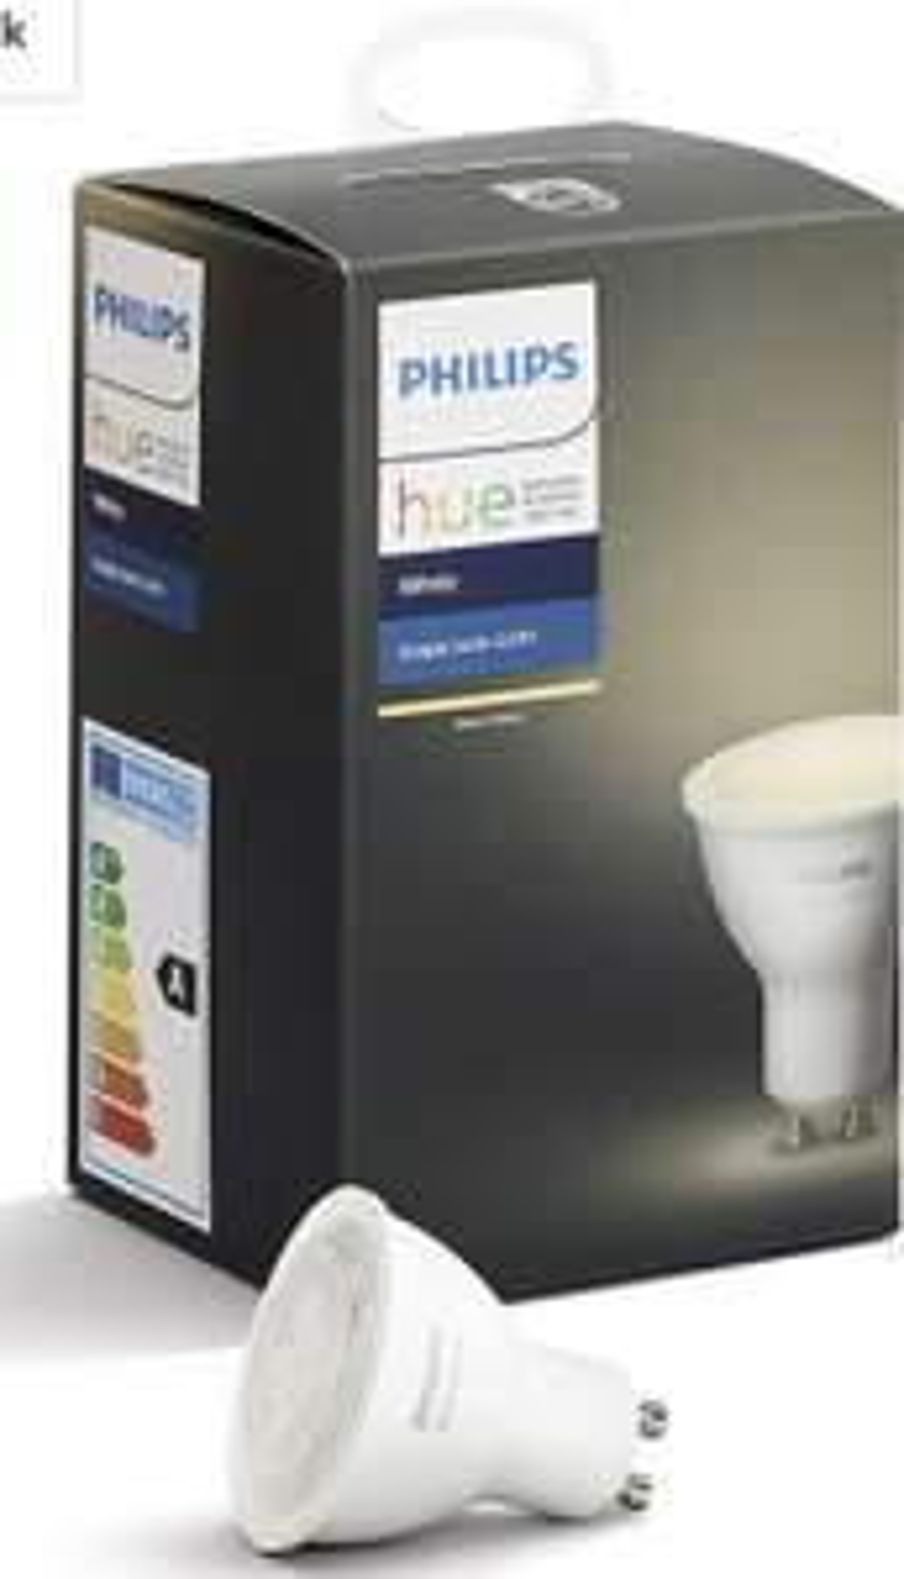 Philips Hue White GU10 LED 1-er Spot, dimmbar, warmweißes Licht,steuerbar via App, kompatibel mit Amazon Alexa (Echo, Echo Dot)